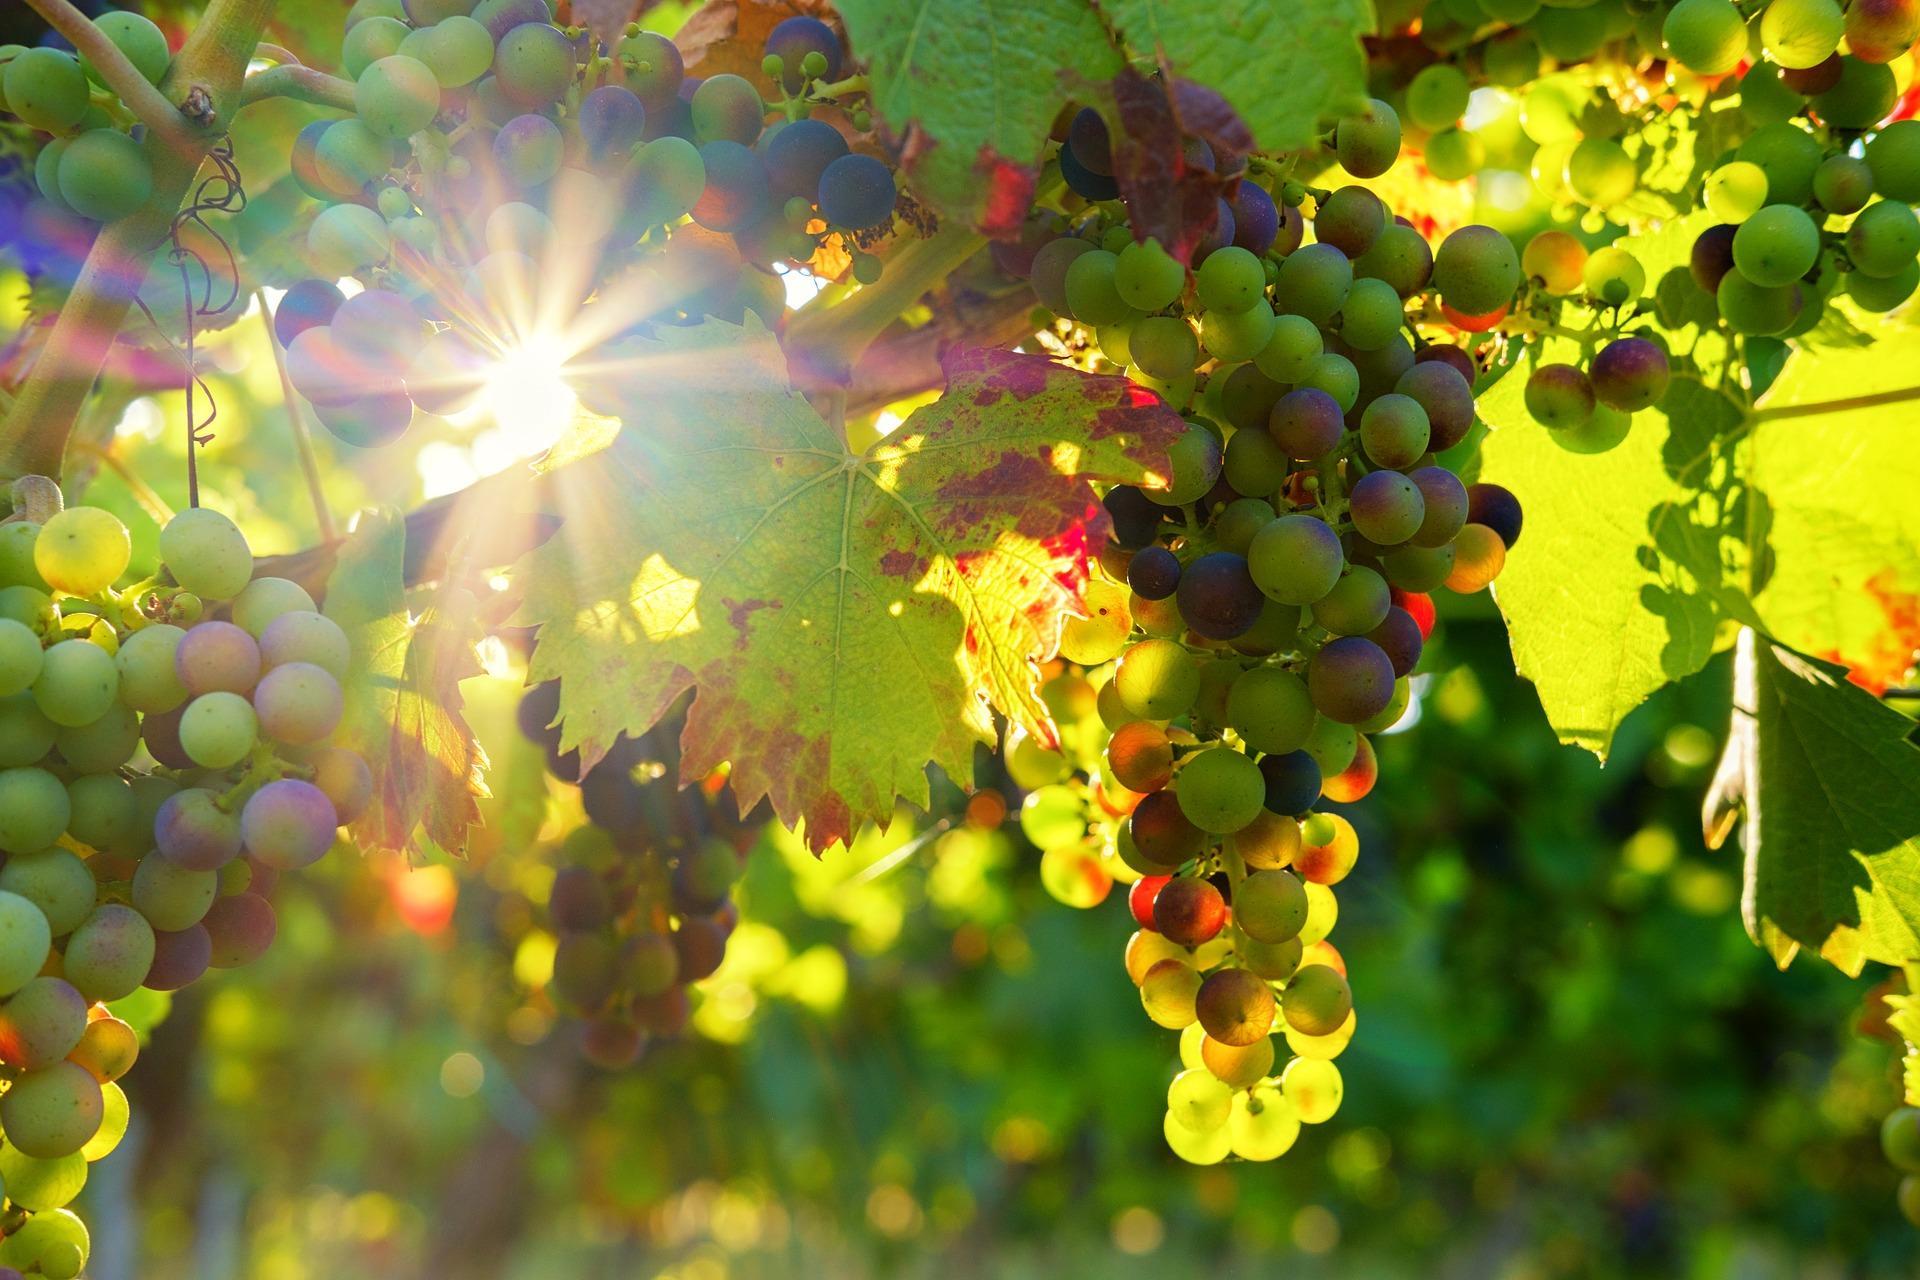 grapes-3550729_1920